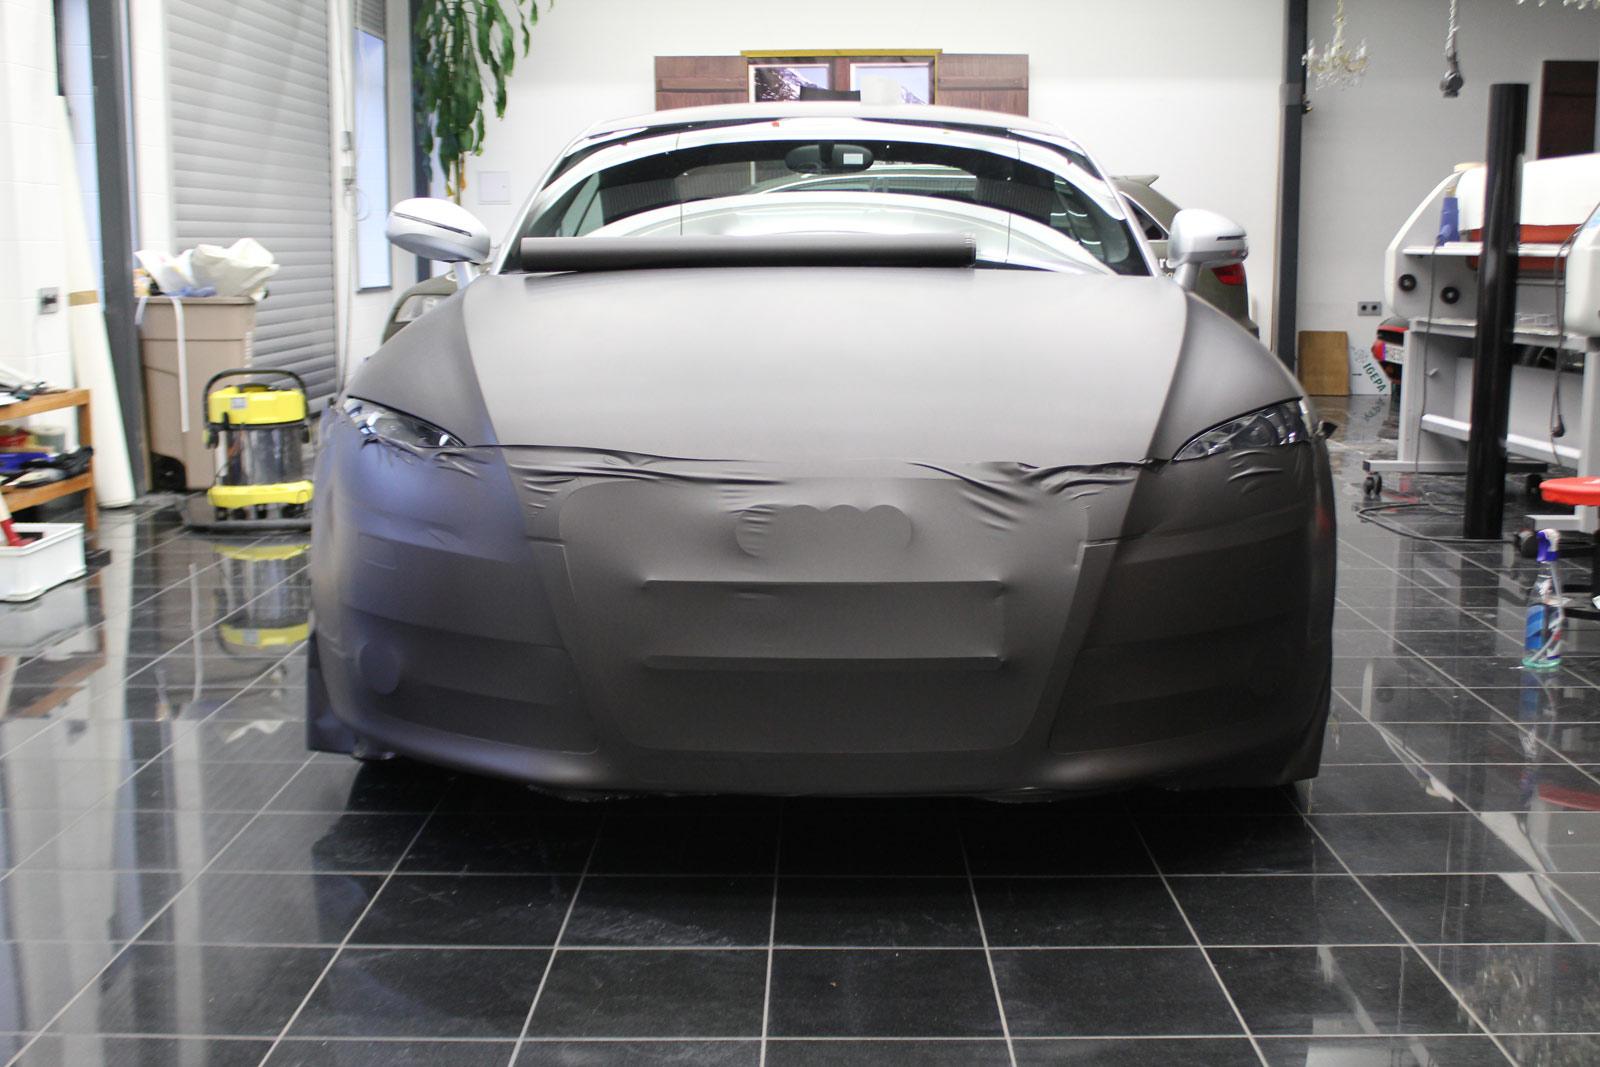 Audi_TT_Braun_Matt_Metallic_Branding_12